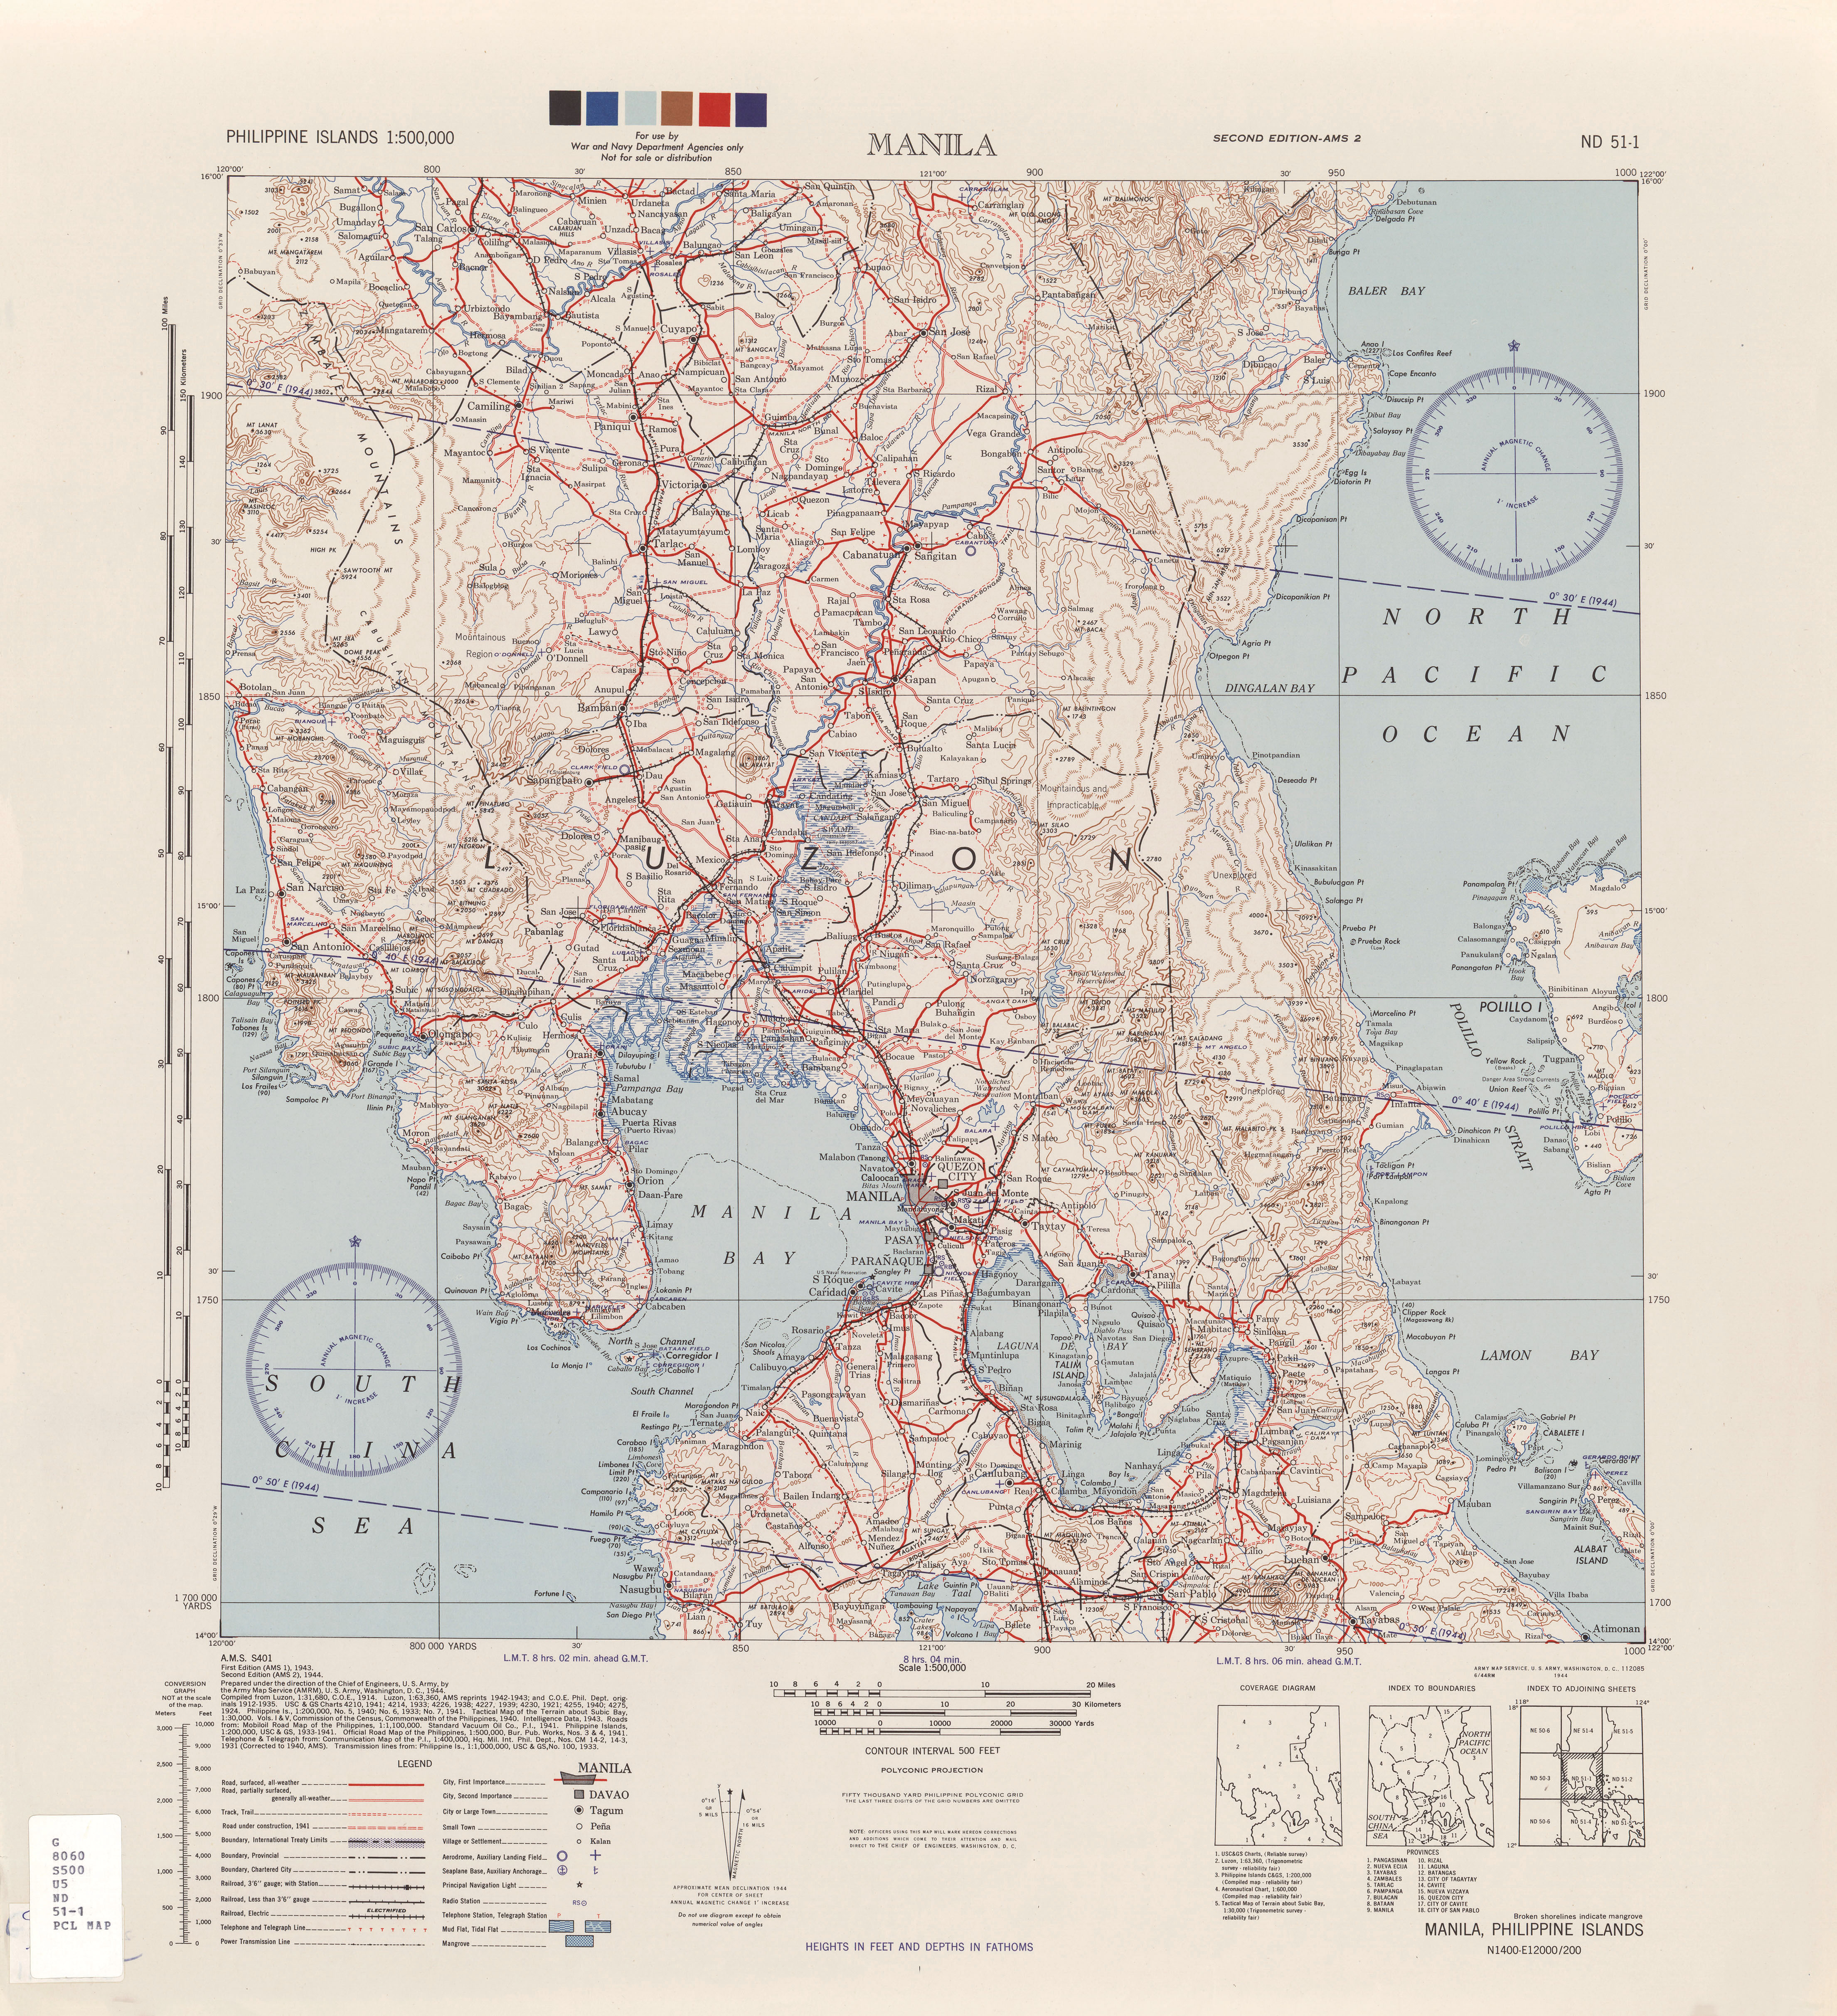 Panay Island Topographic Map